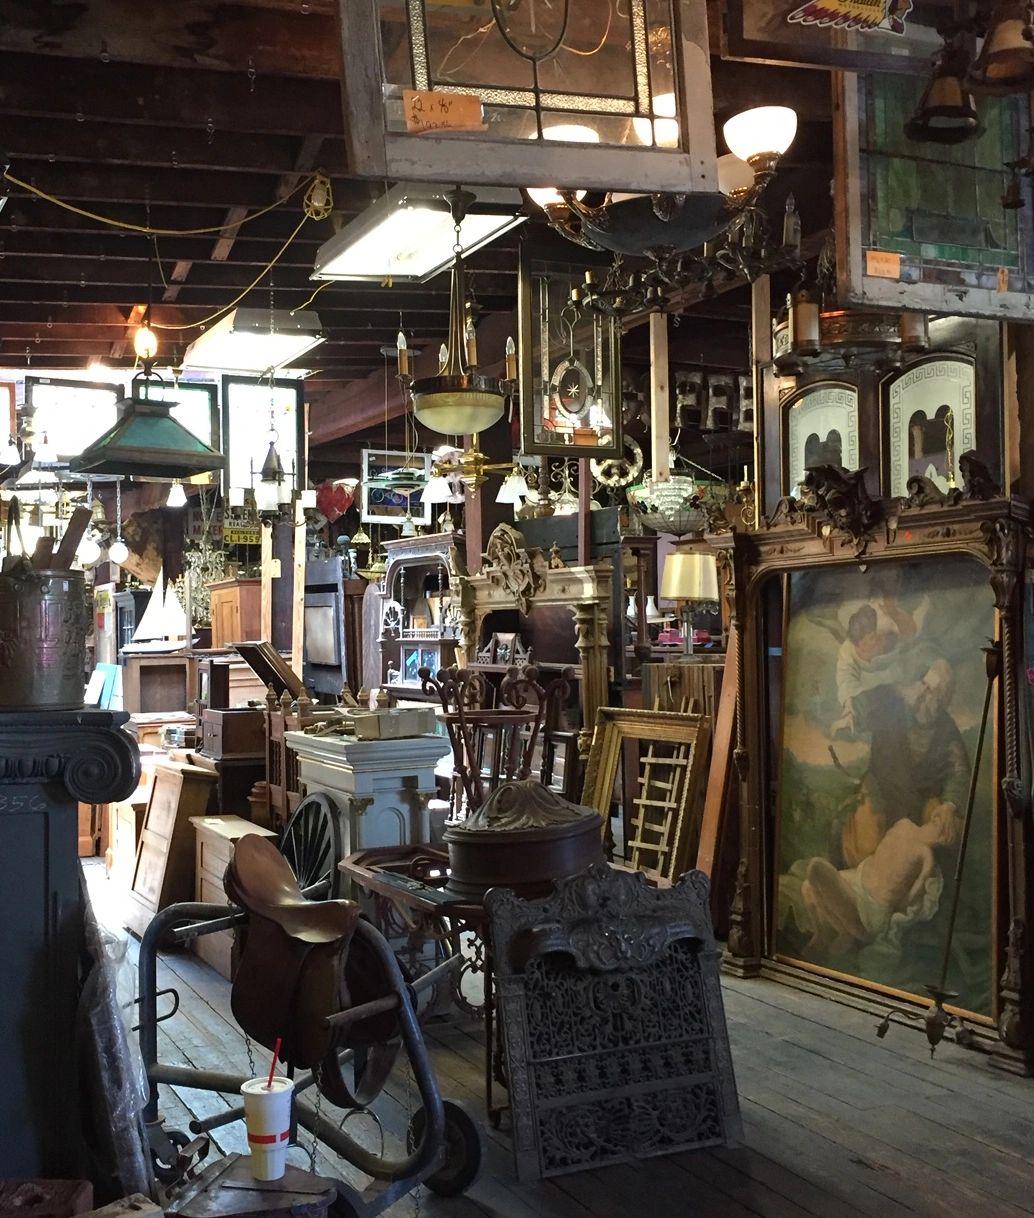 Doc S Architectural Salvage Antique Stores Antique Architectural